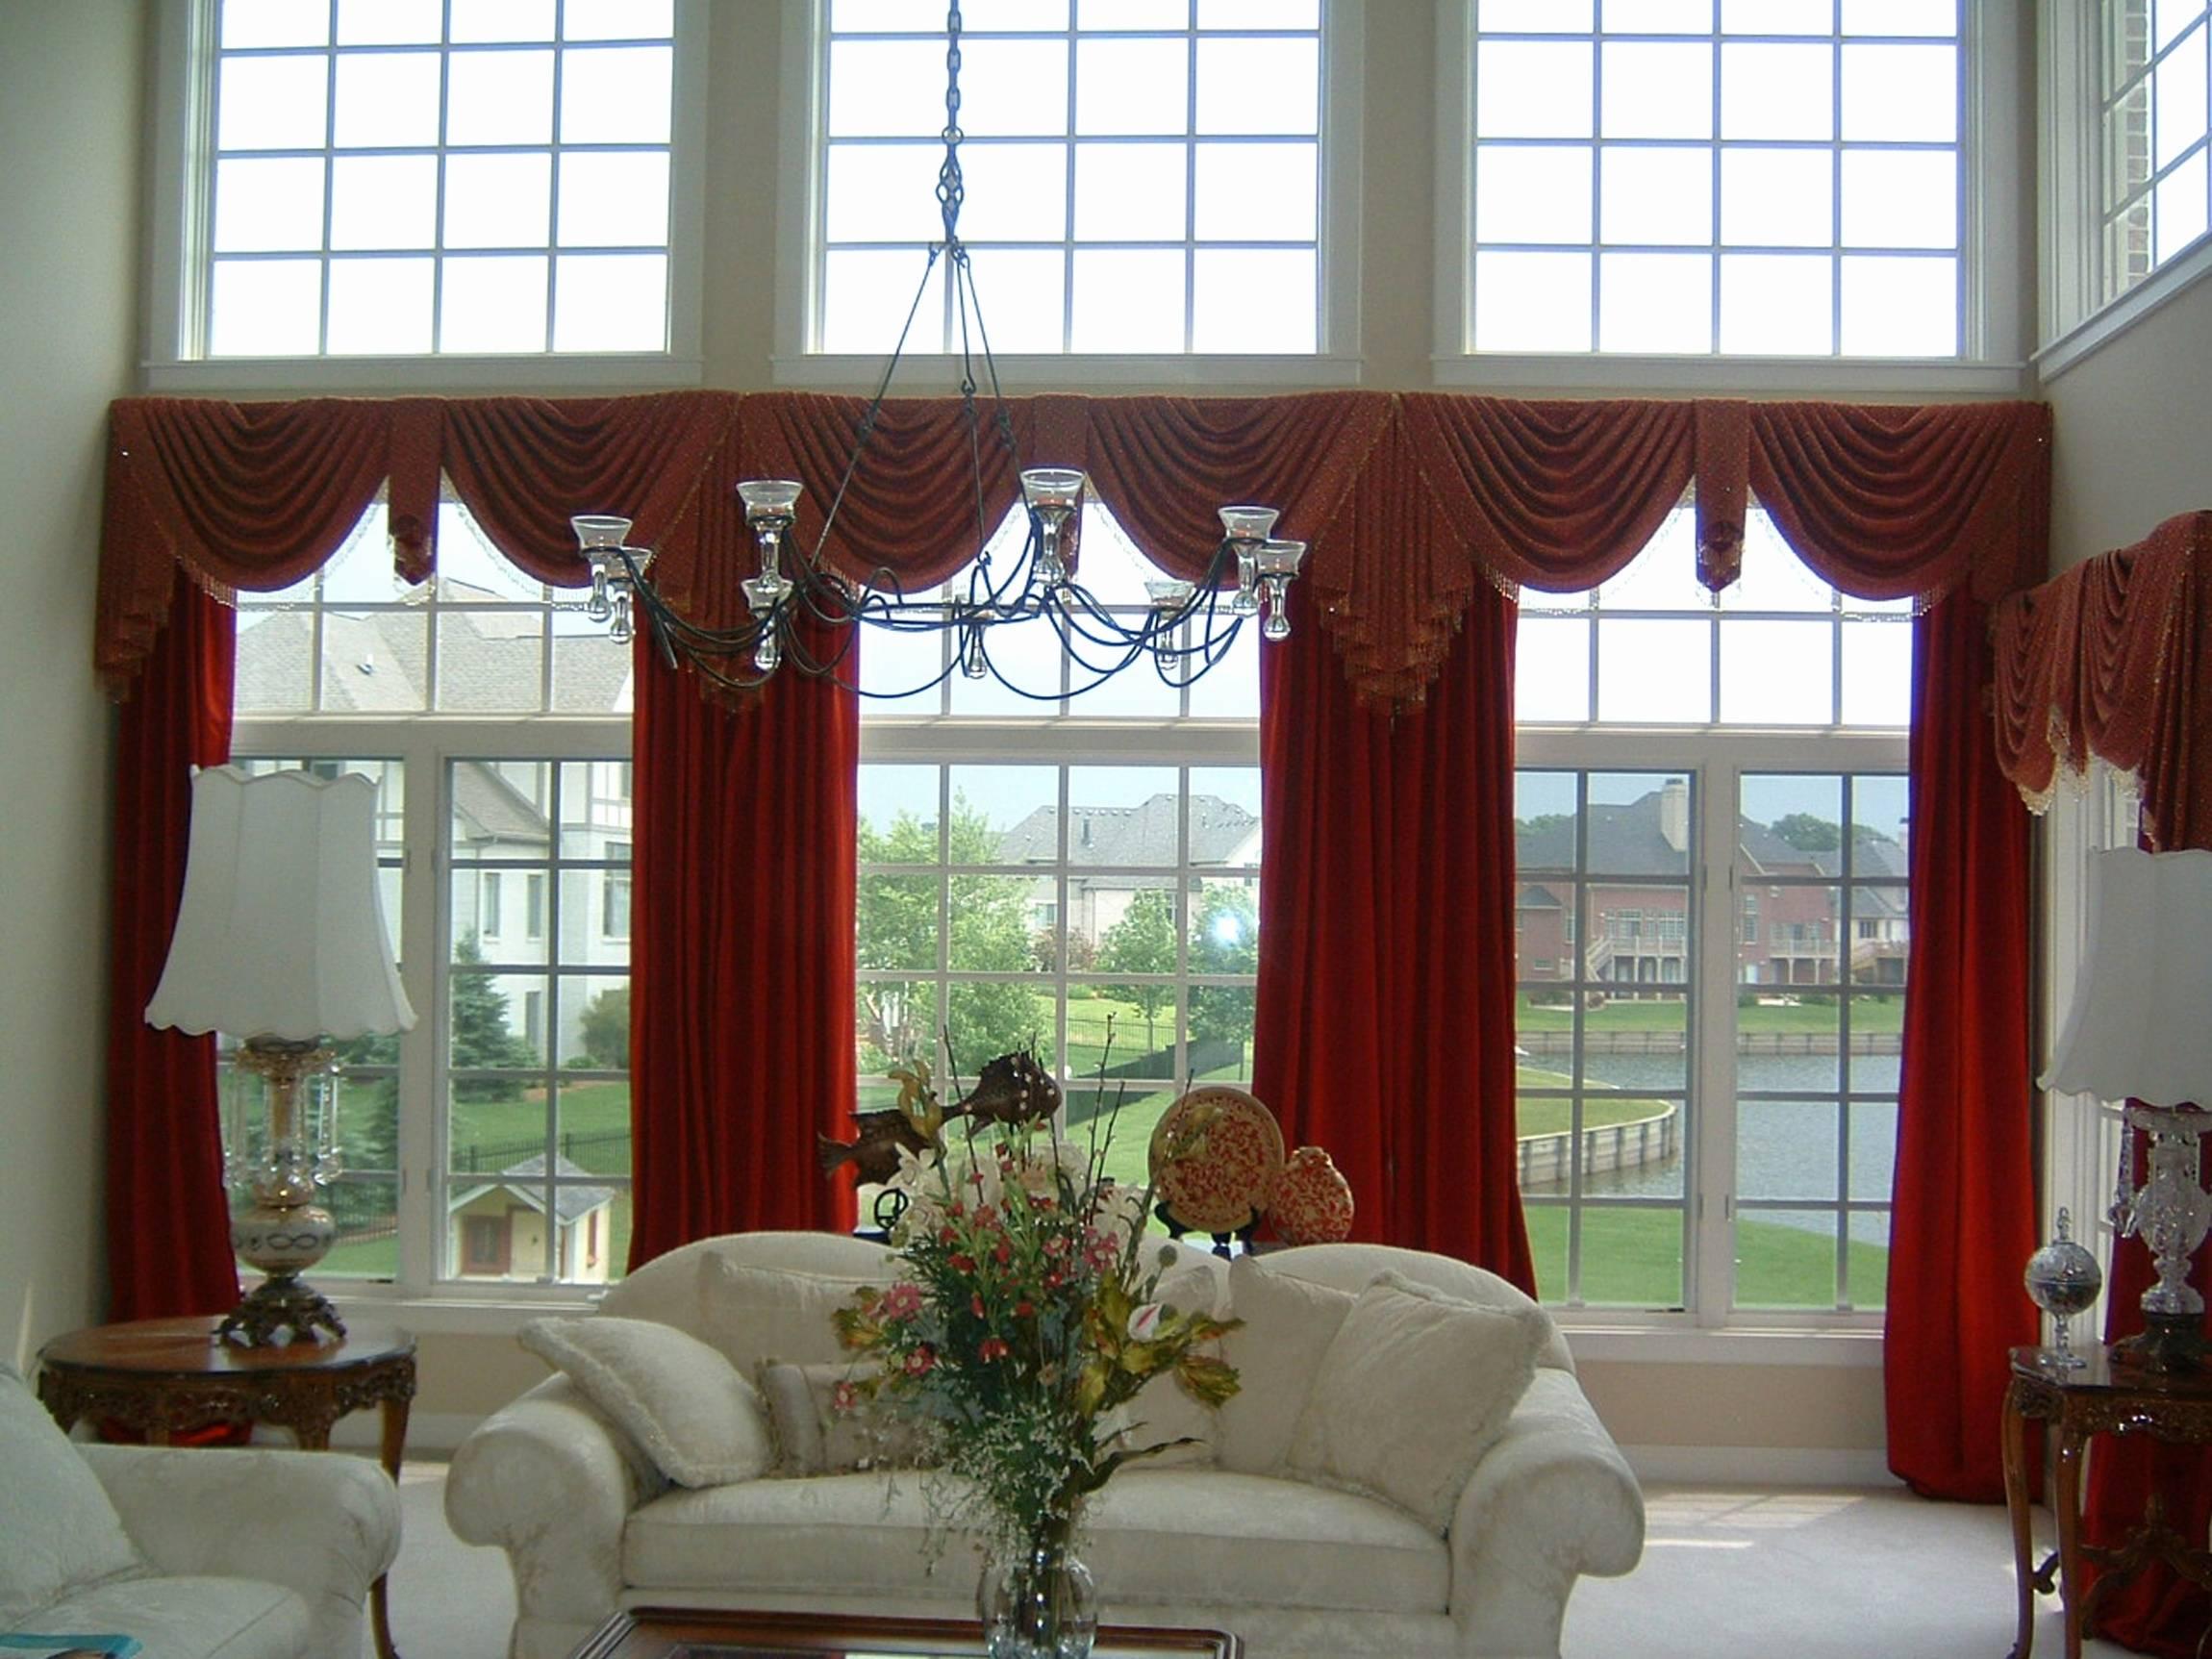 bay window window treatment ideas fresh curtain excelent blind and curtain ideas s bay window of bay window window treatment ideas